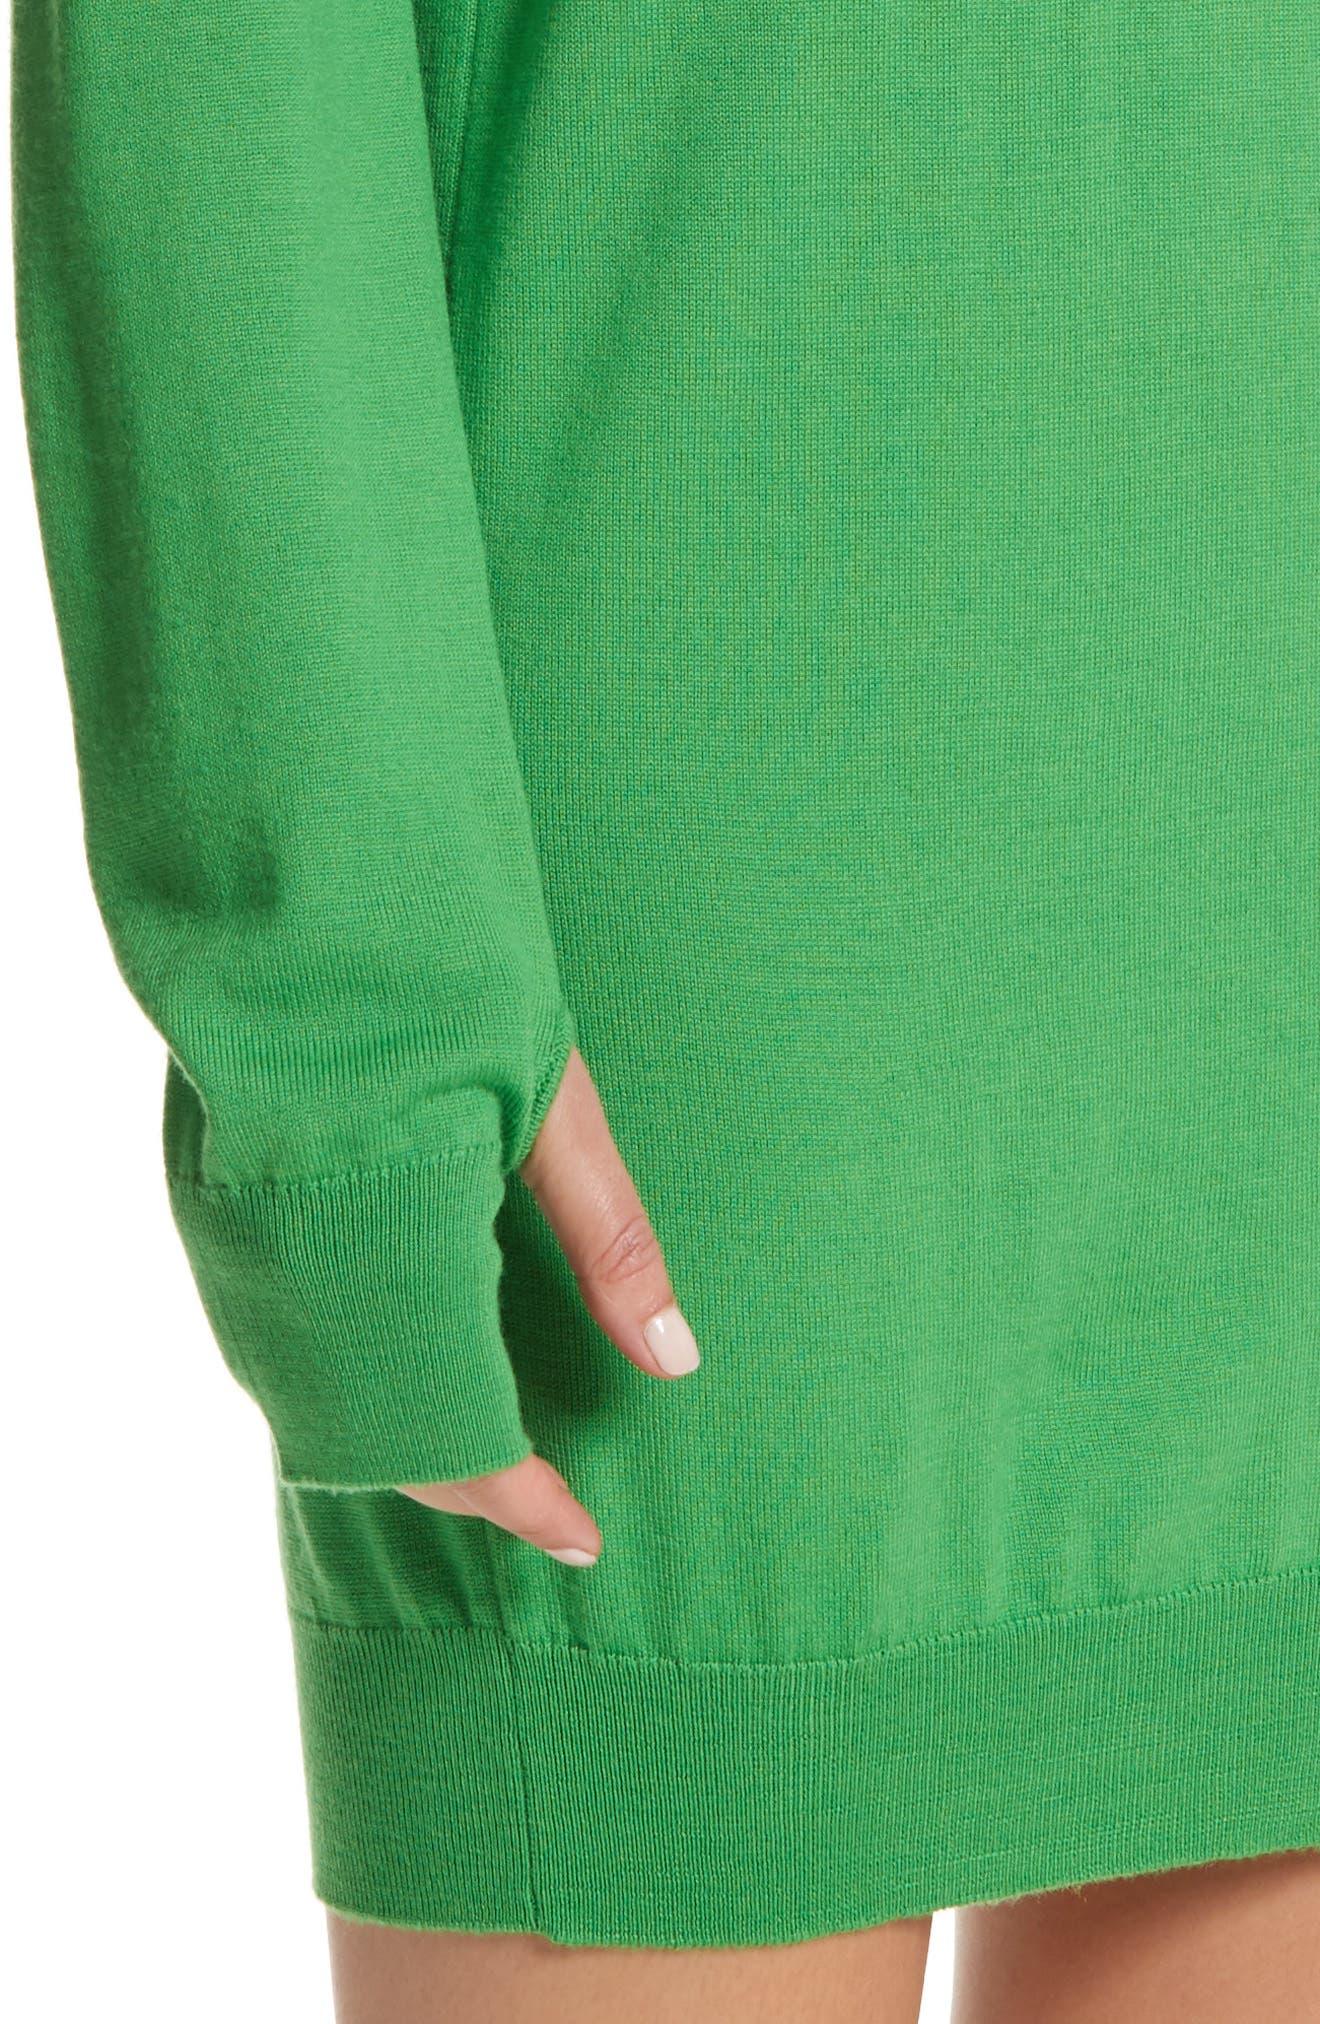 Wool Sweater Dress,                             Alternate thumbnail 4, color,                             300